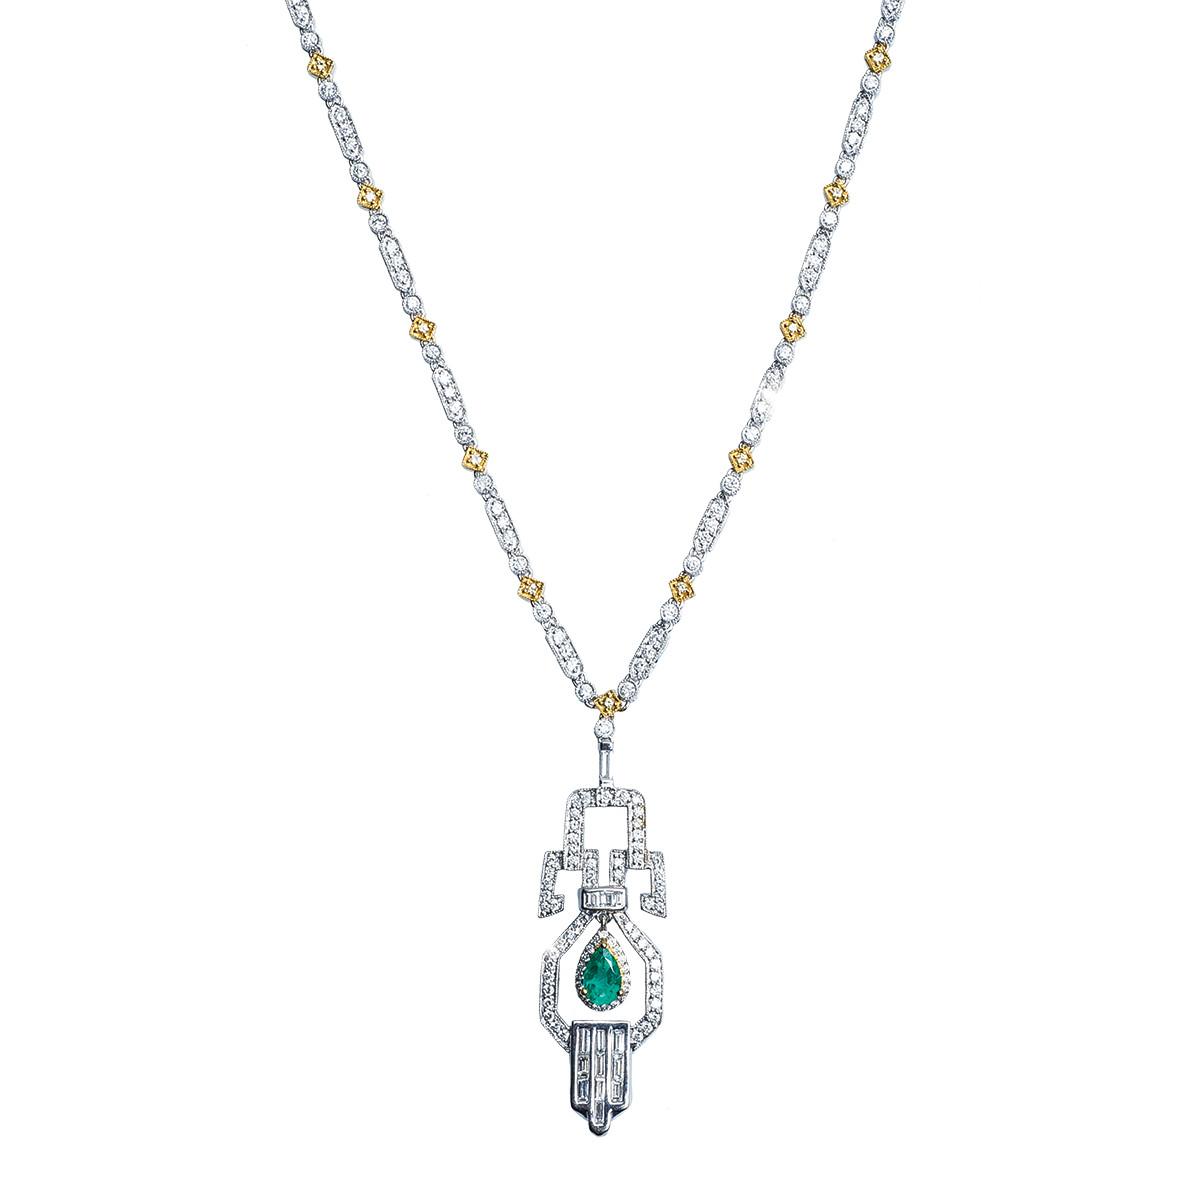 Vintage Art Deco-Inspired 3.40 CTW Emerald, White & Yellow Diamond Necklace